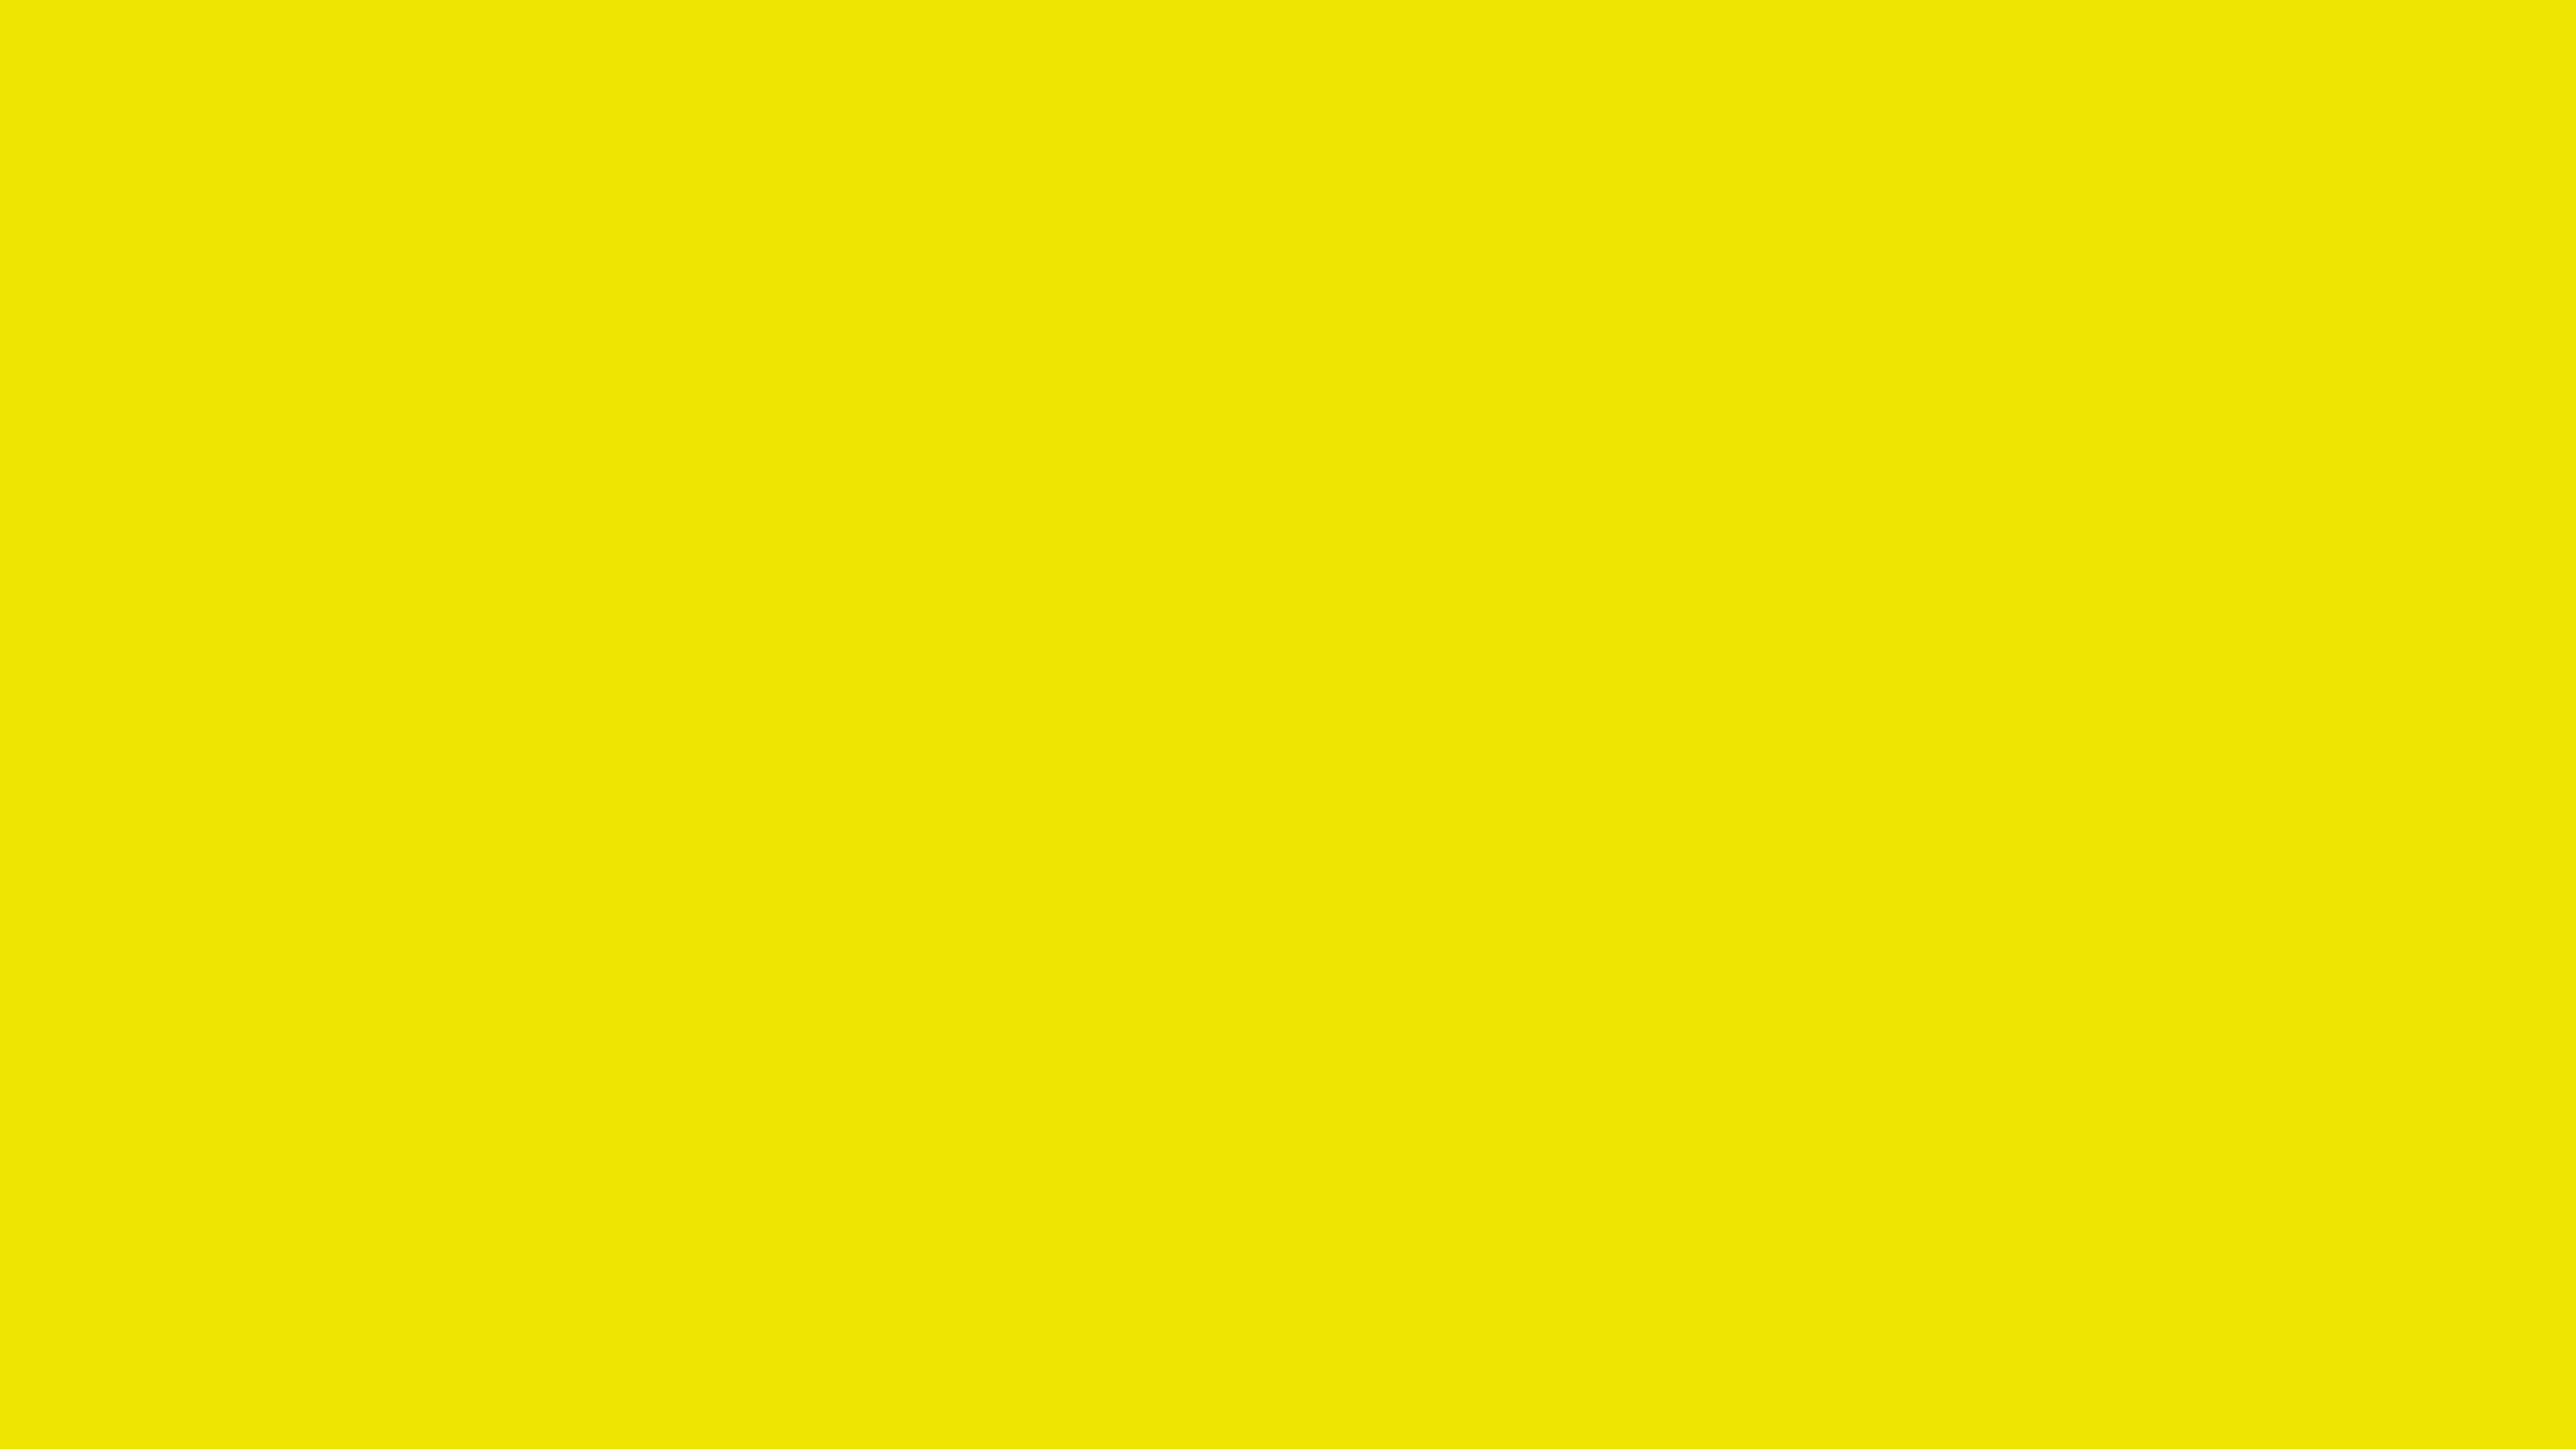 5120x2880 Titanium Yellow Solid Color Background